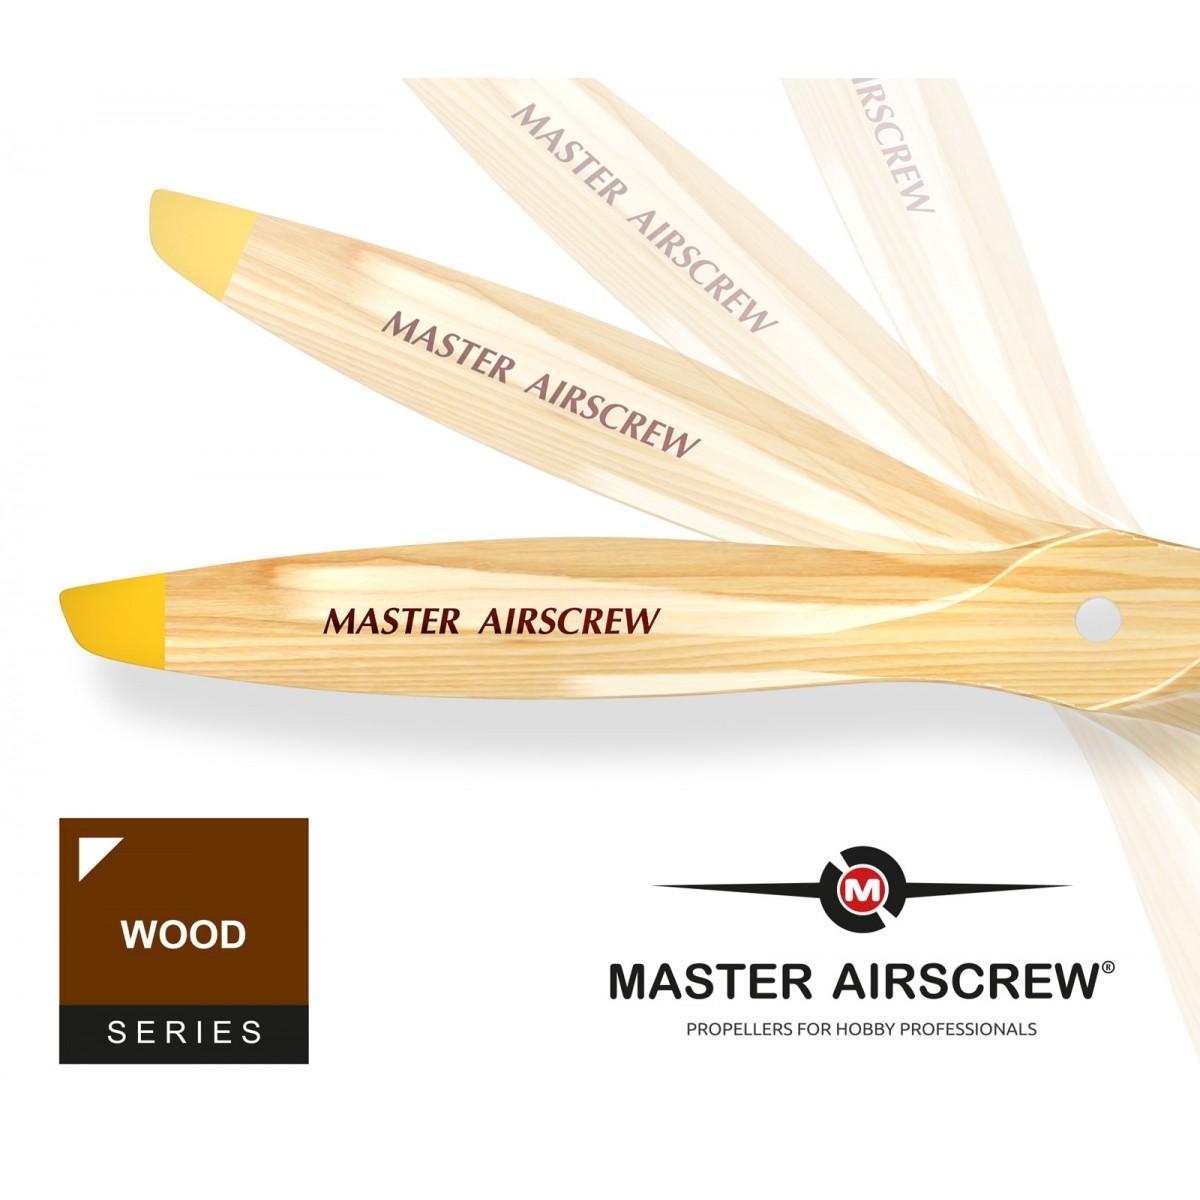 MA1160B - Hélice Master Airscrew Wood Series 11x6